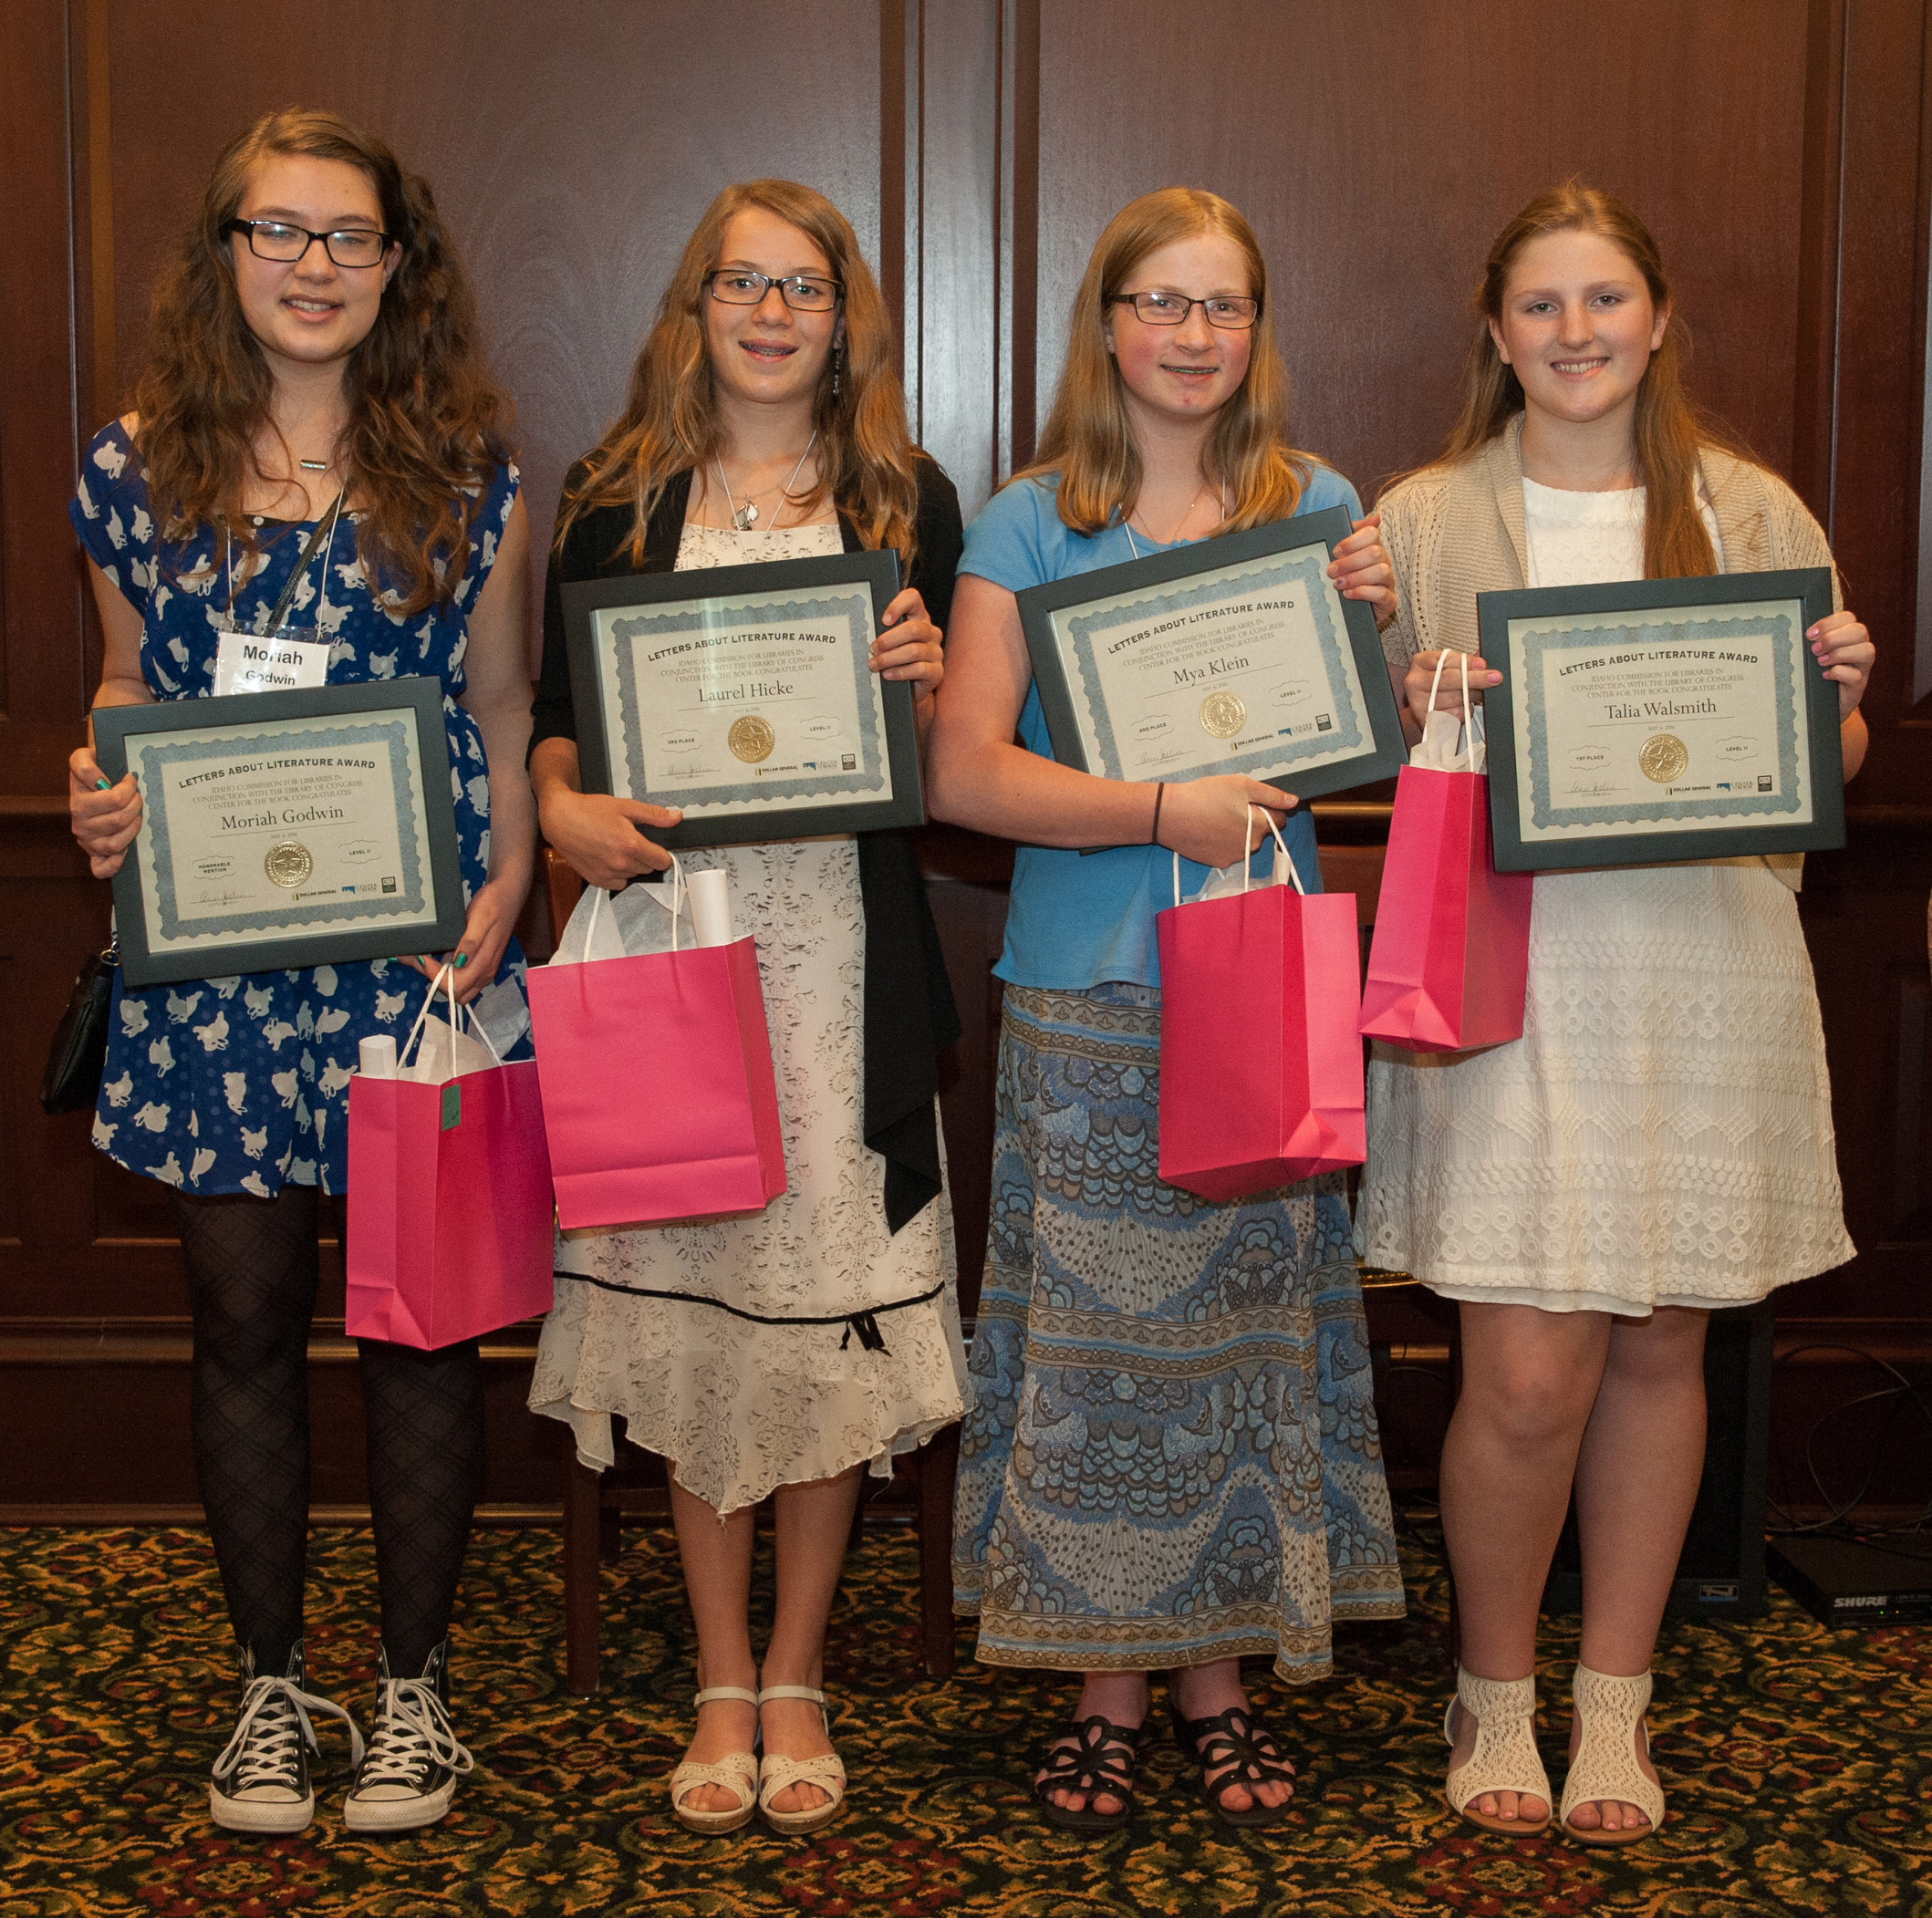 photo of Moriah Godwin, Laurel Hicke, Mya Klein, Talia Walsmith